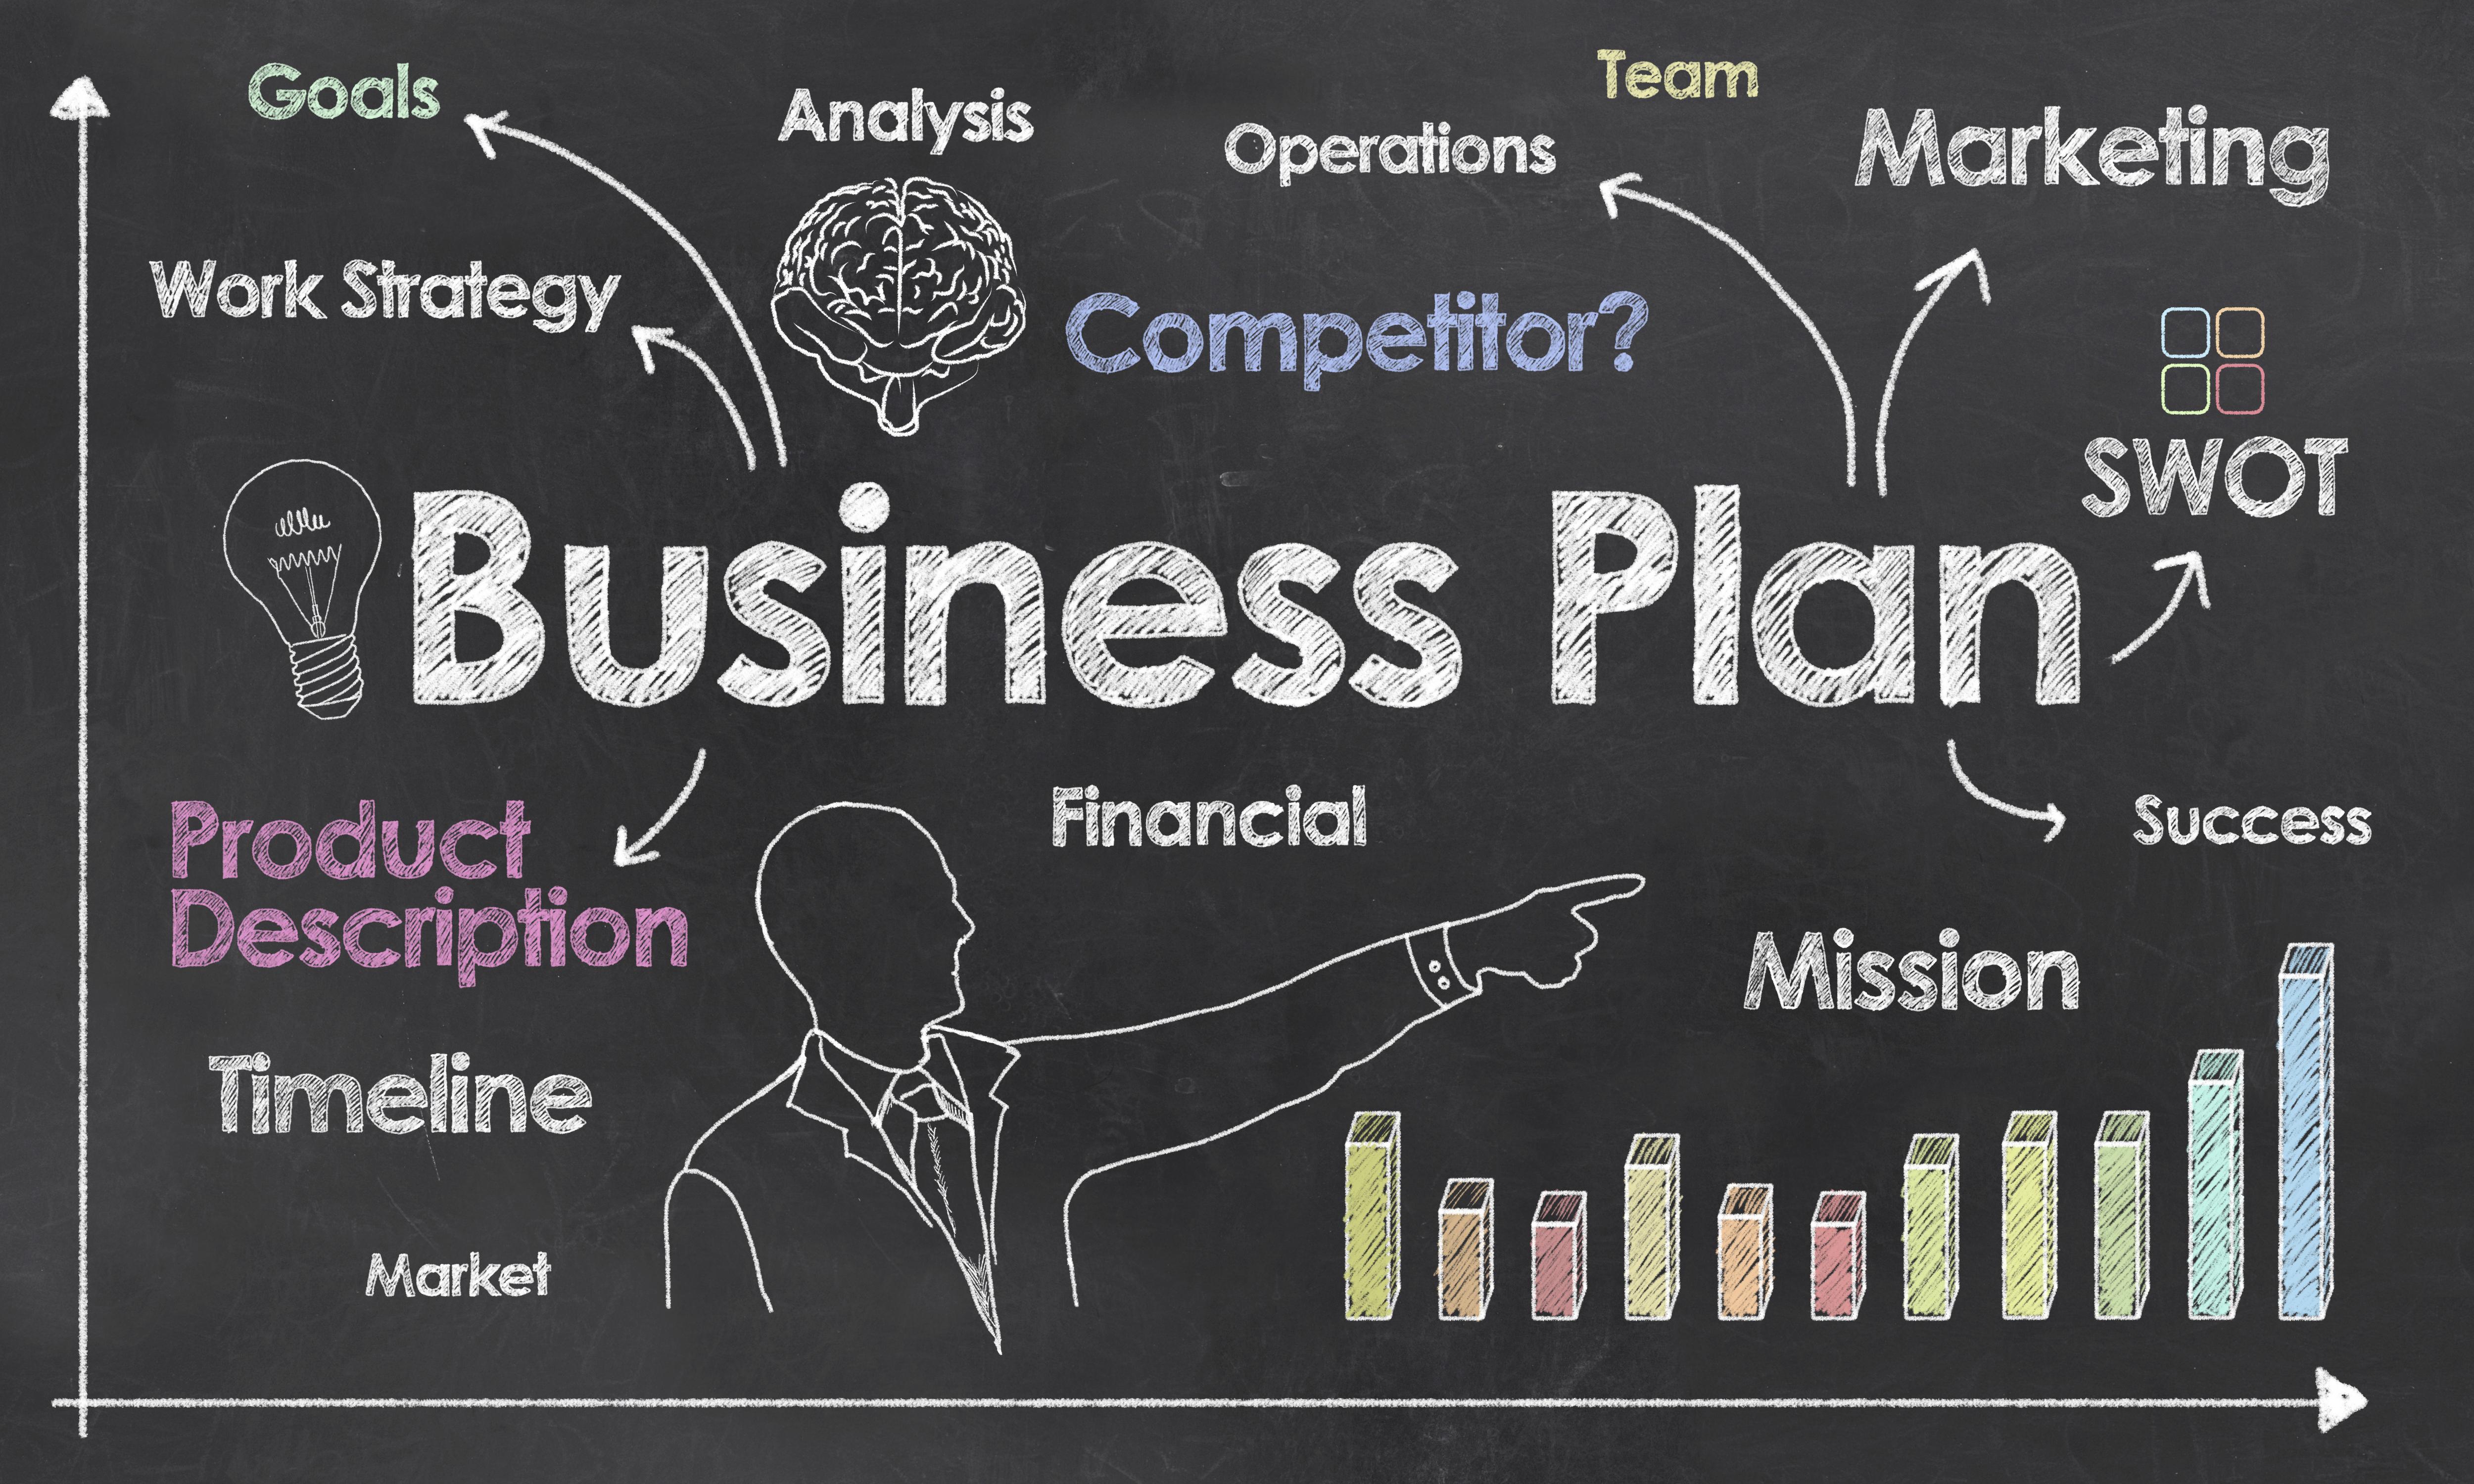 Business Plan?